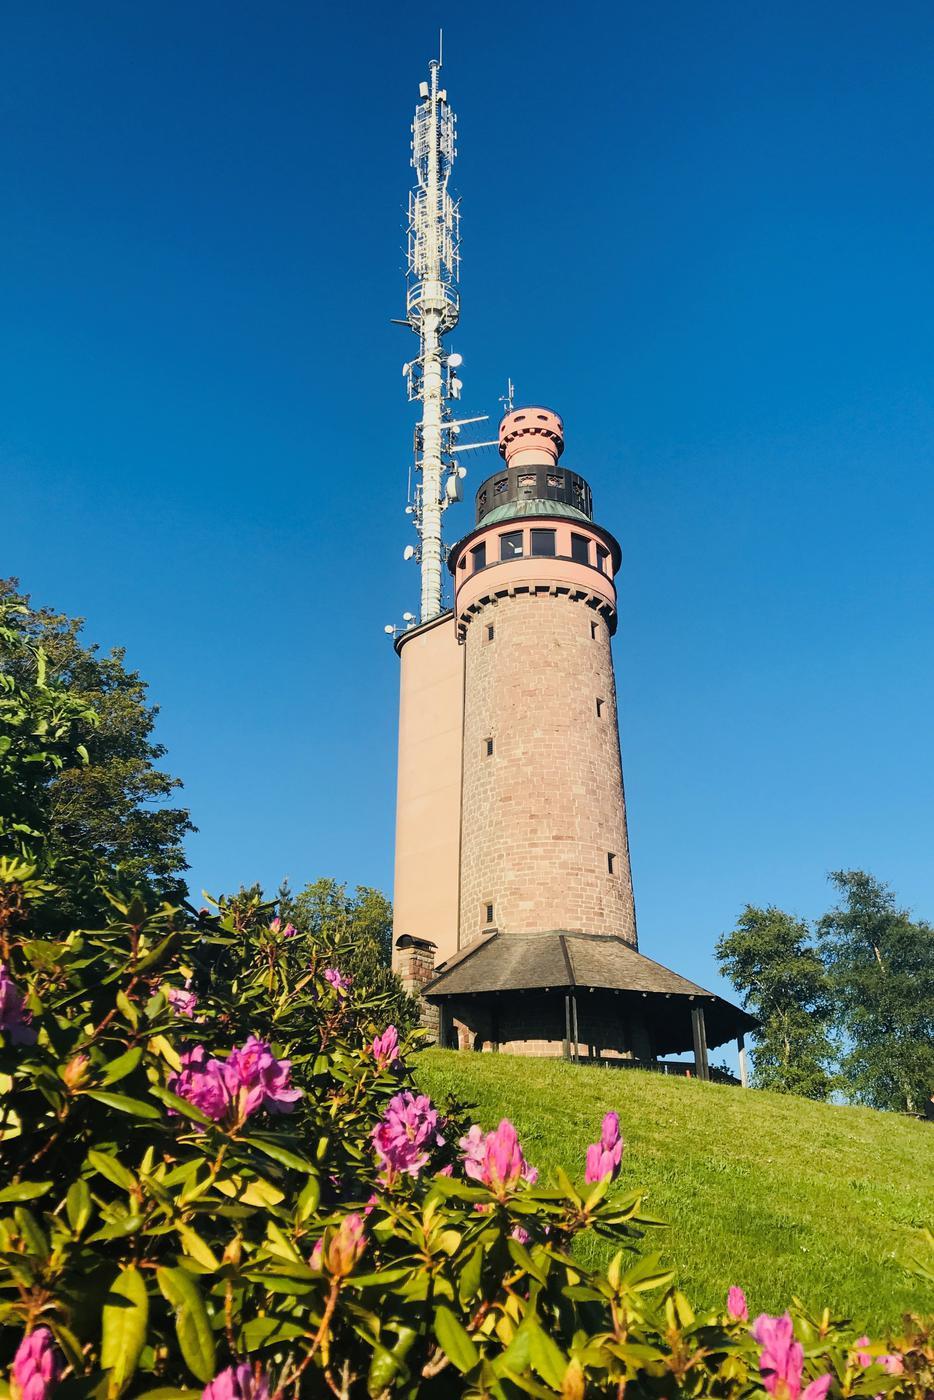 Der Turm auf dem Baden-Badener Hausberg Merkur.